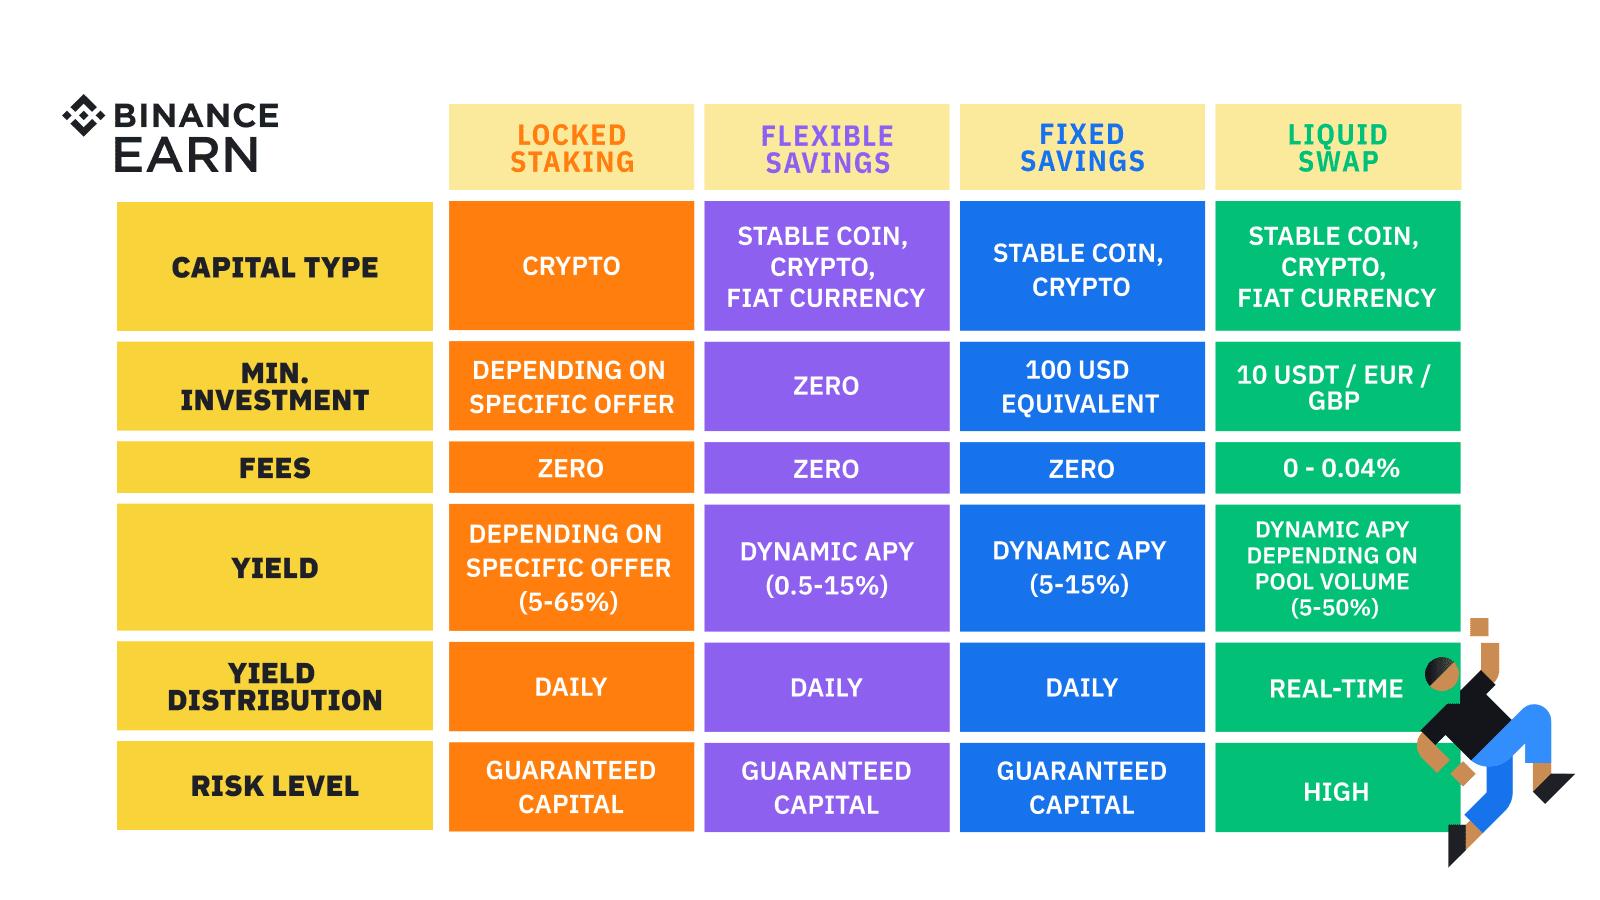 Make Money With Crypto: 10 Ways To Earn Bitcoin and Other Crypto With  Binance Earn | Binance Blog